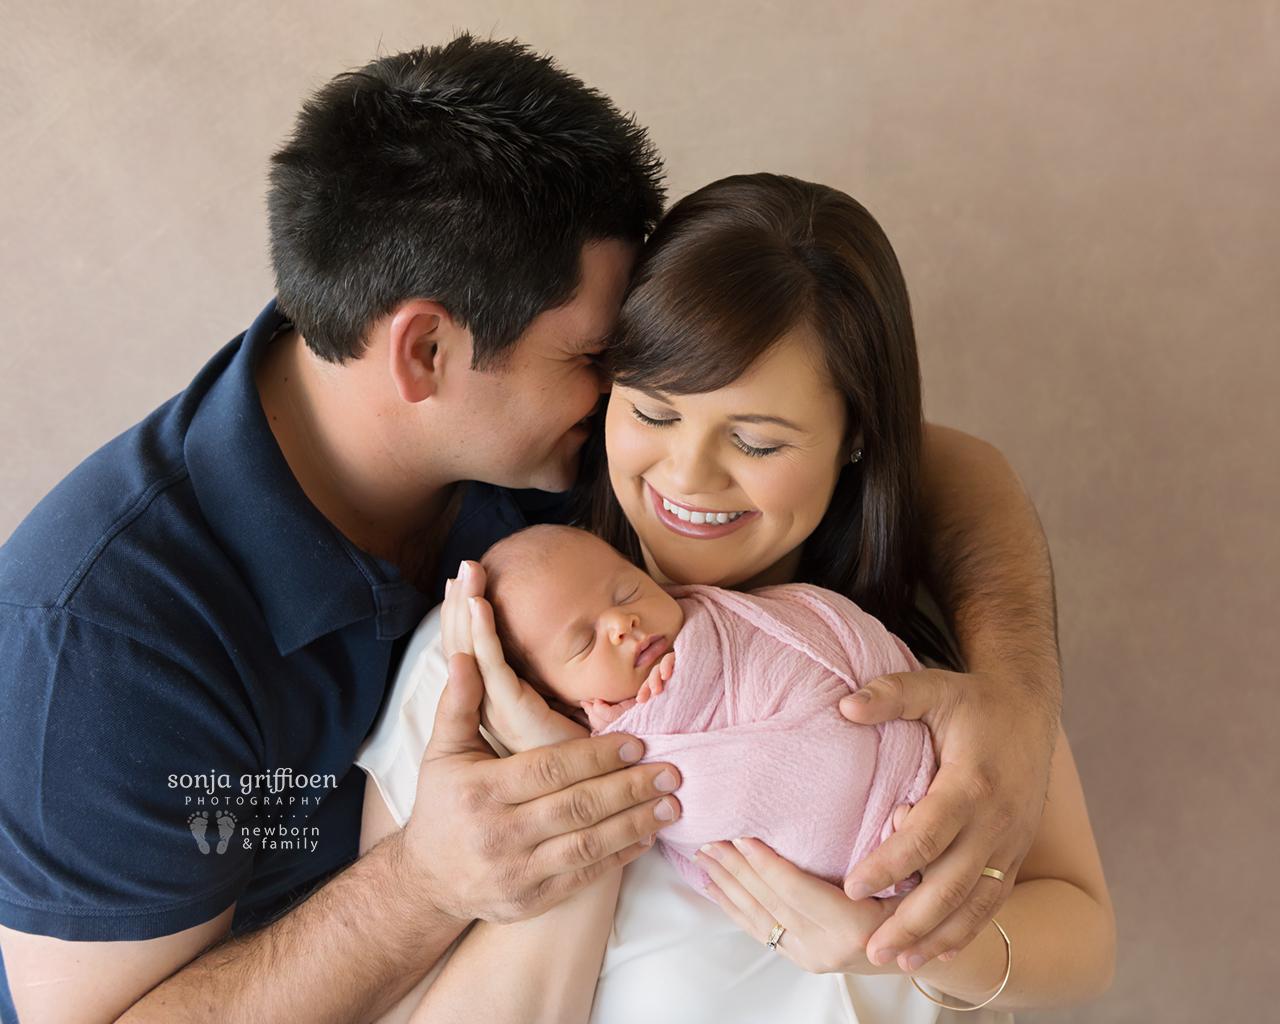 Lilly-Newborn-Brisbane-Newborn-Photographer-Sonja-Griffioen-19.jpg